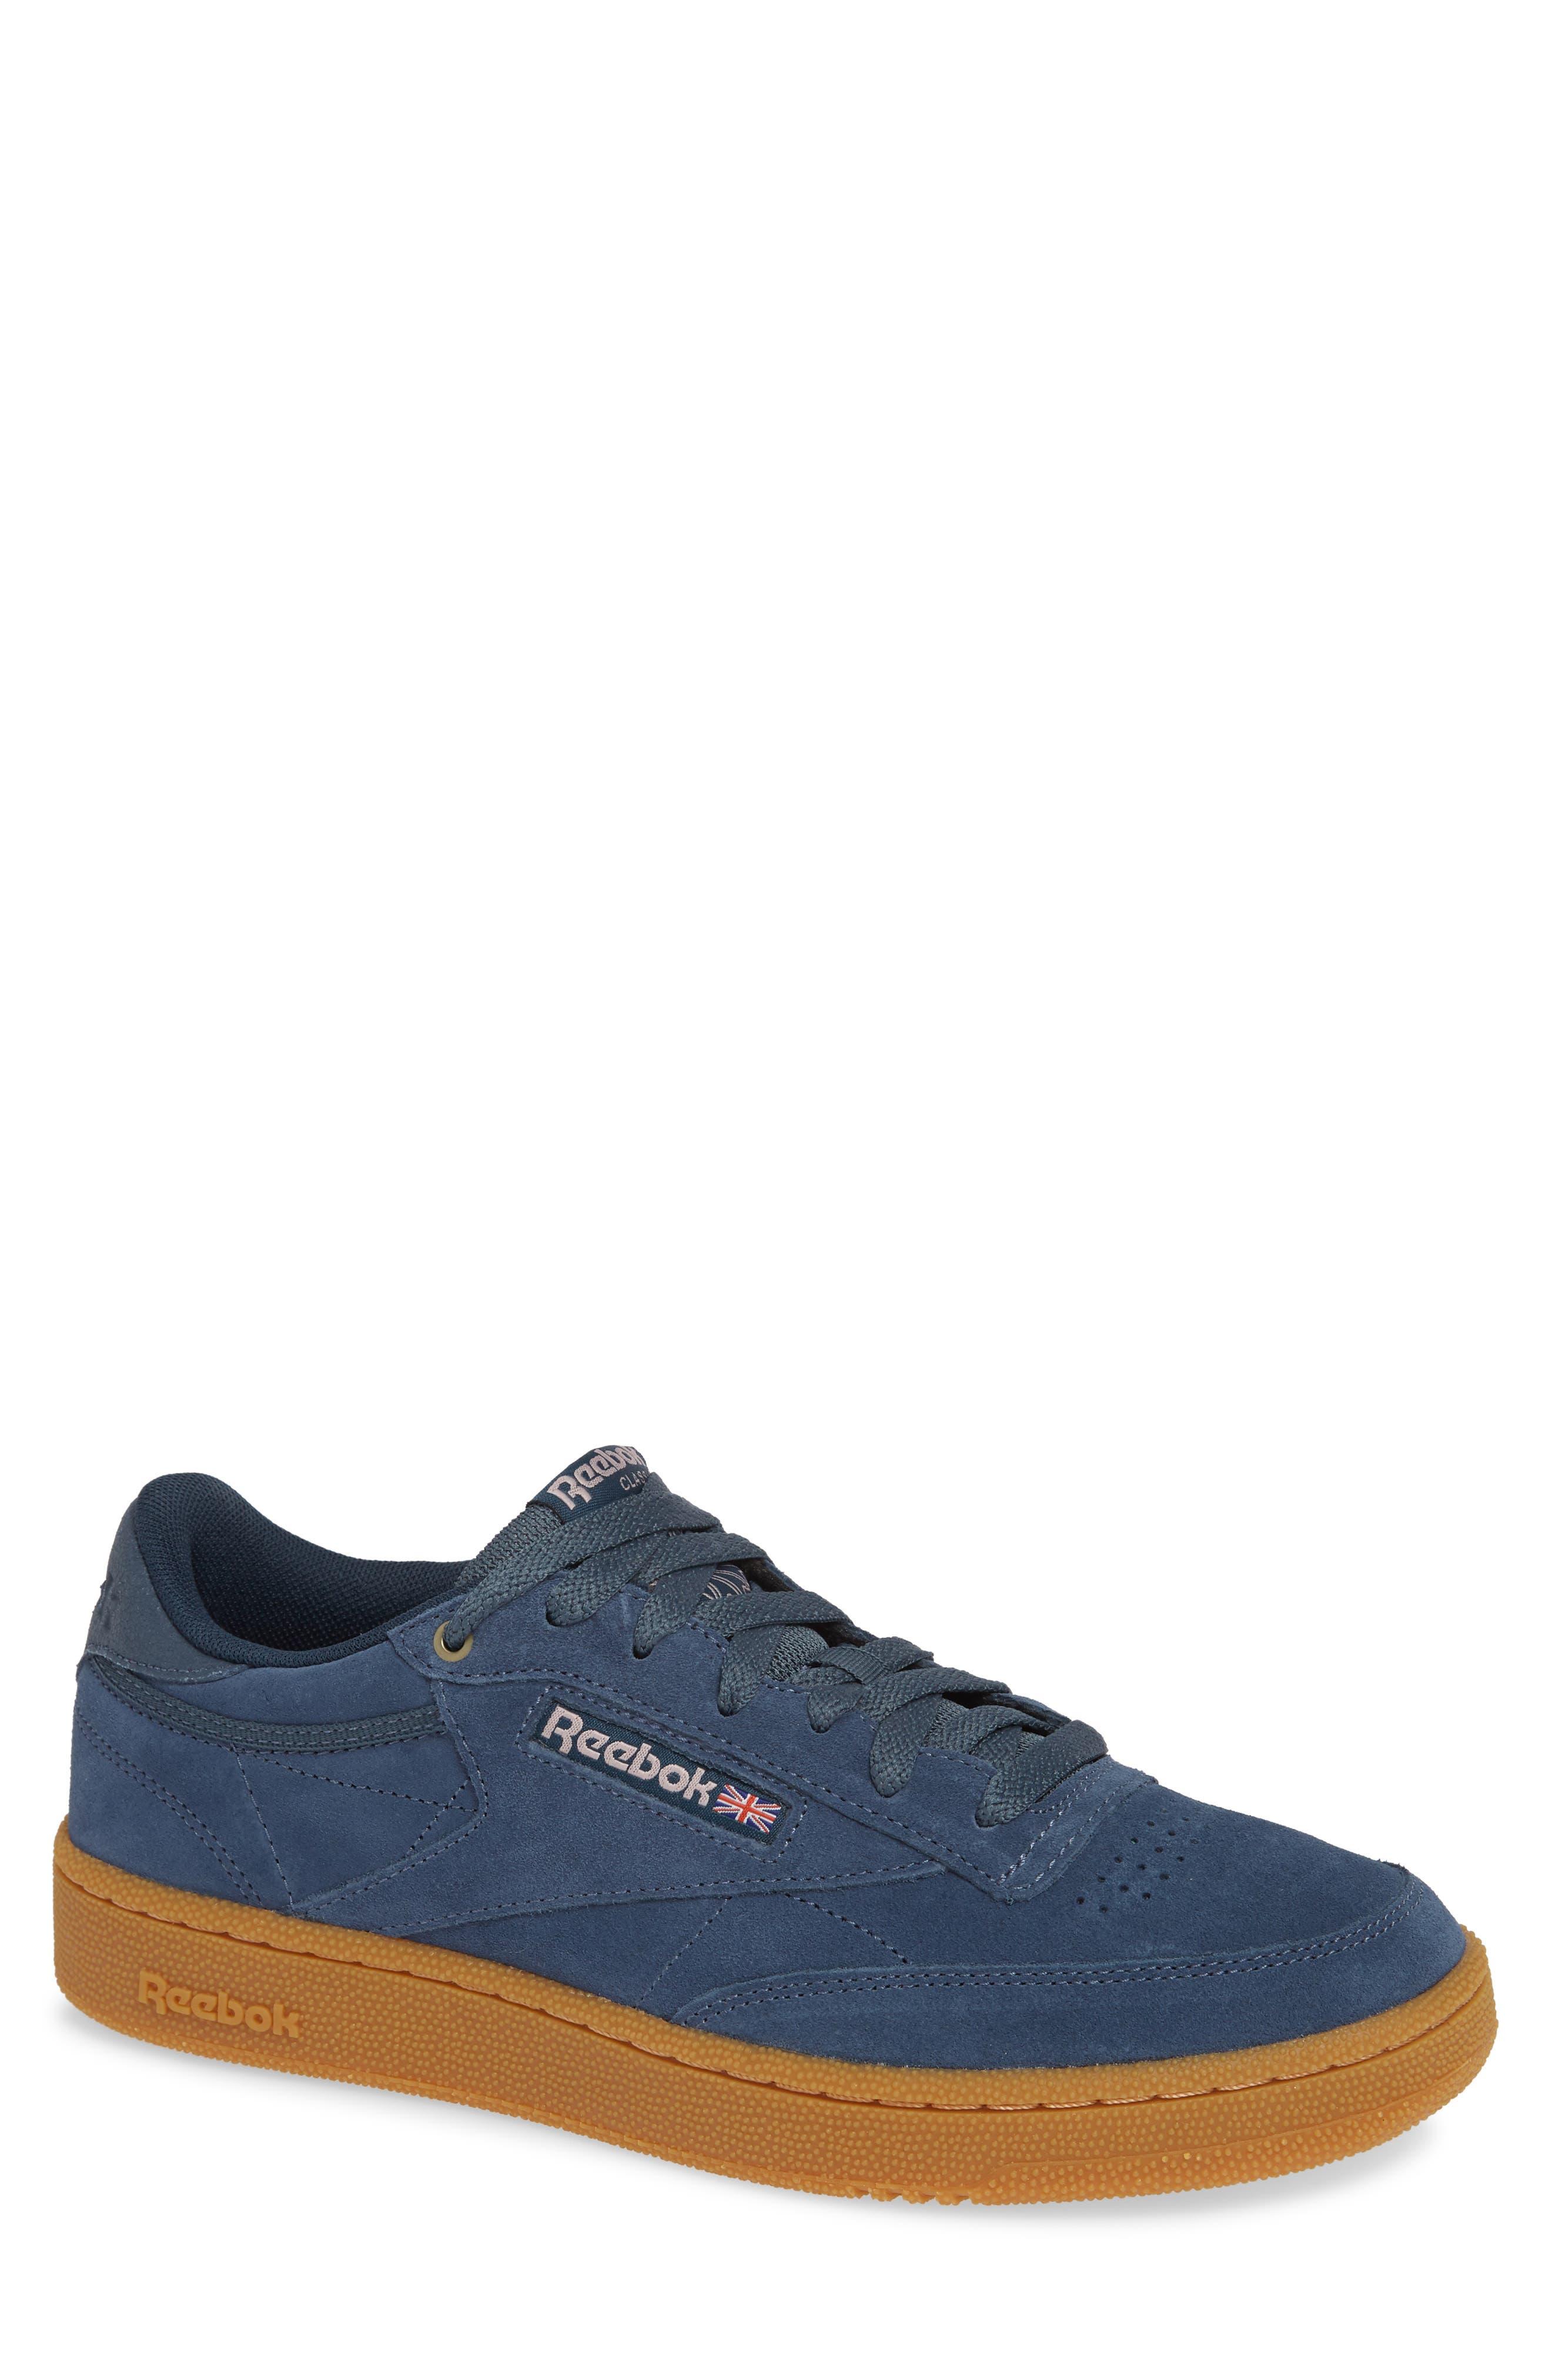 Club C 85 MU Sneaker,                         Main,                         color, 400